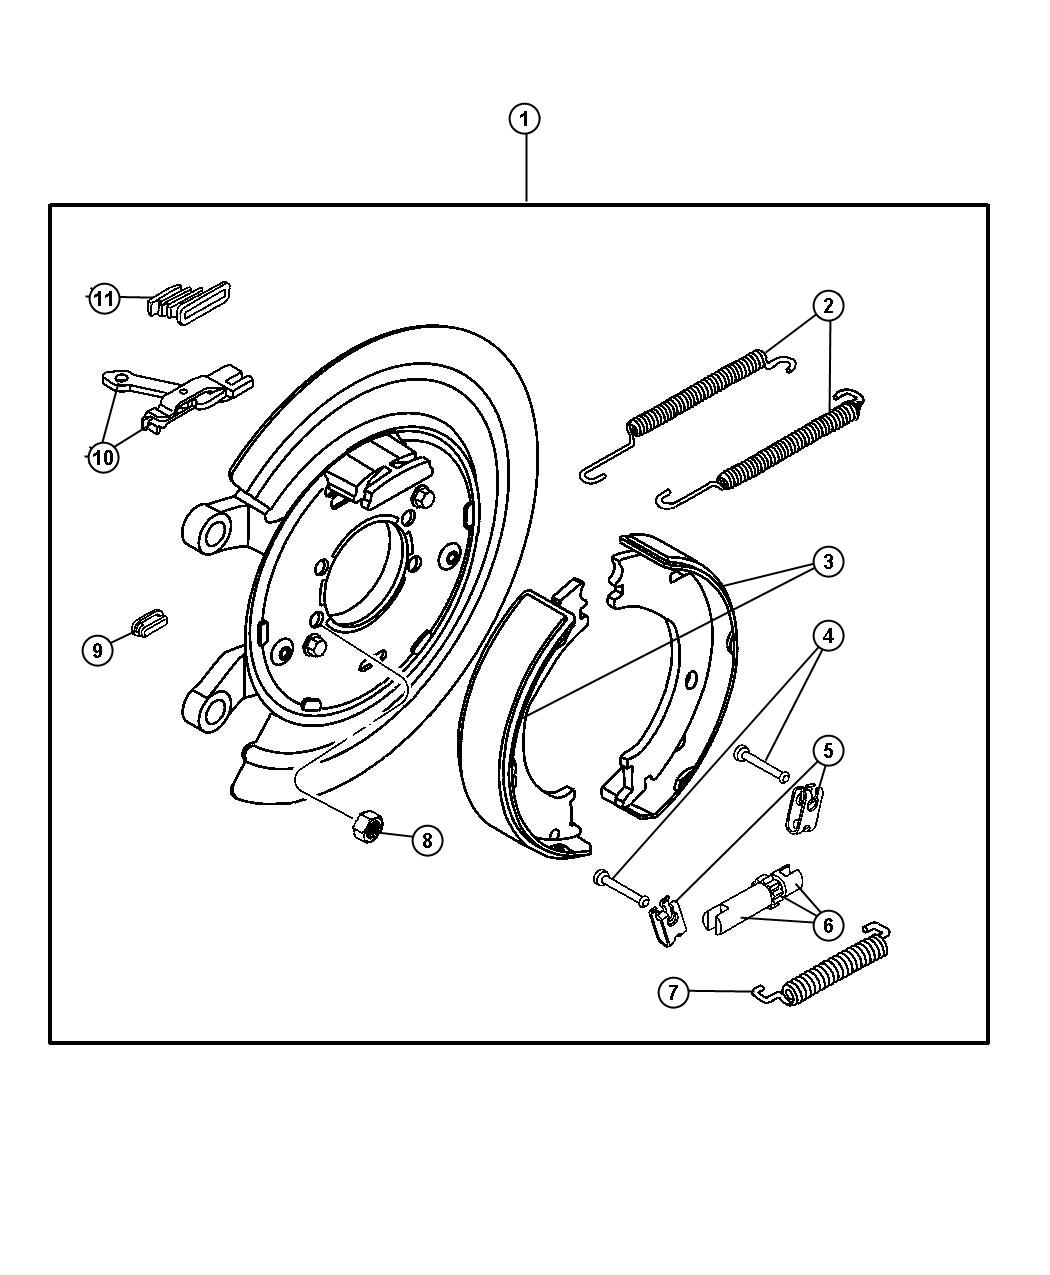 98 Plymouth Breeze Engine Diagram Trusted Schematics 1997 Q45 1998 1999 Neon Problems